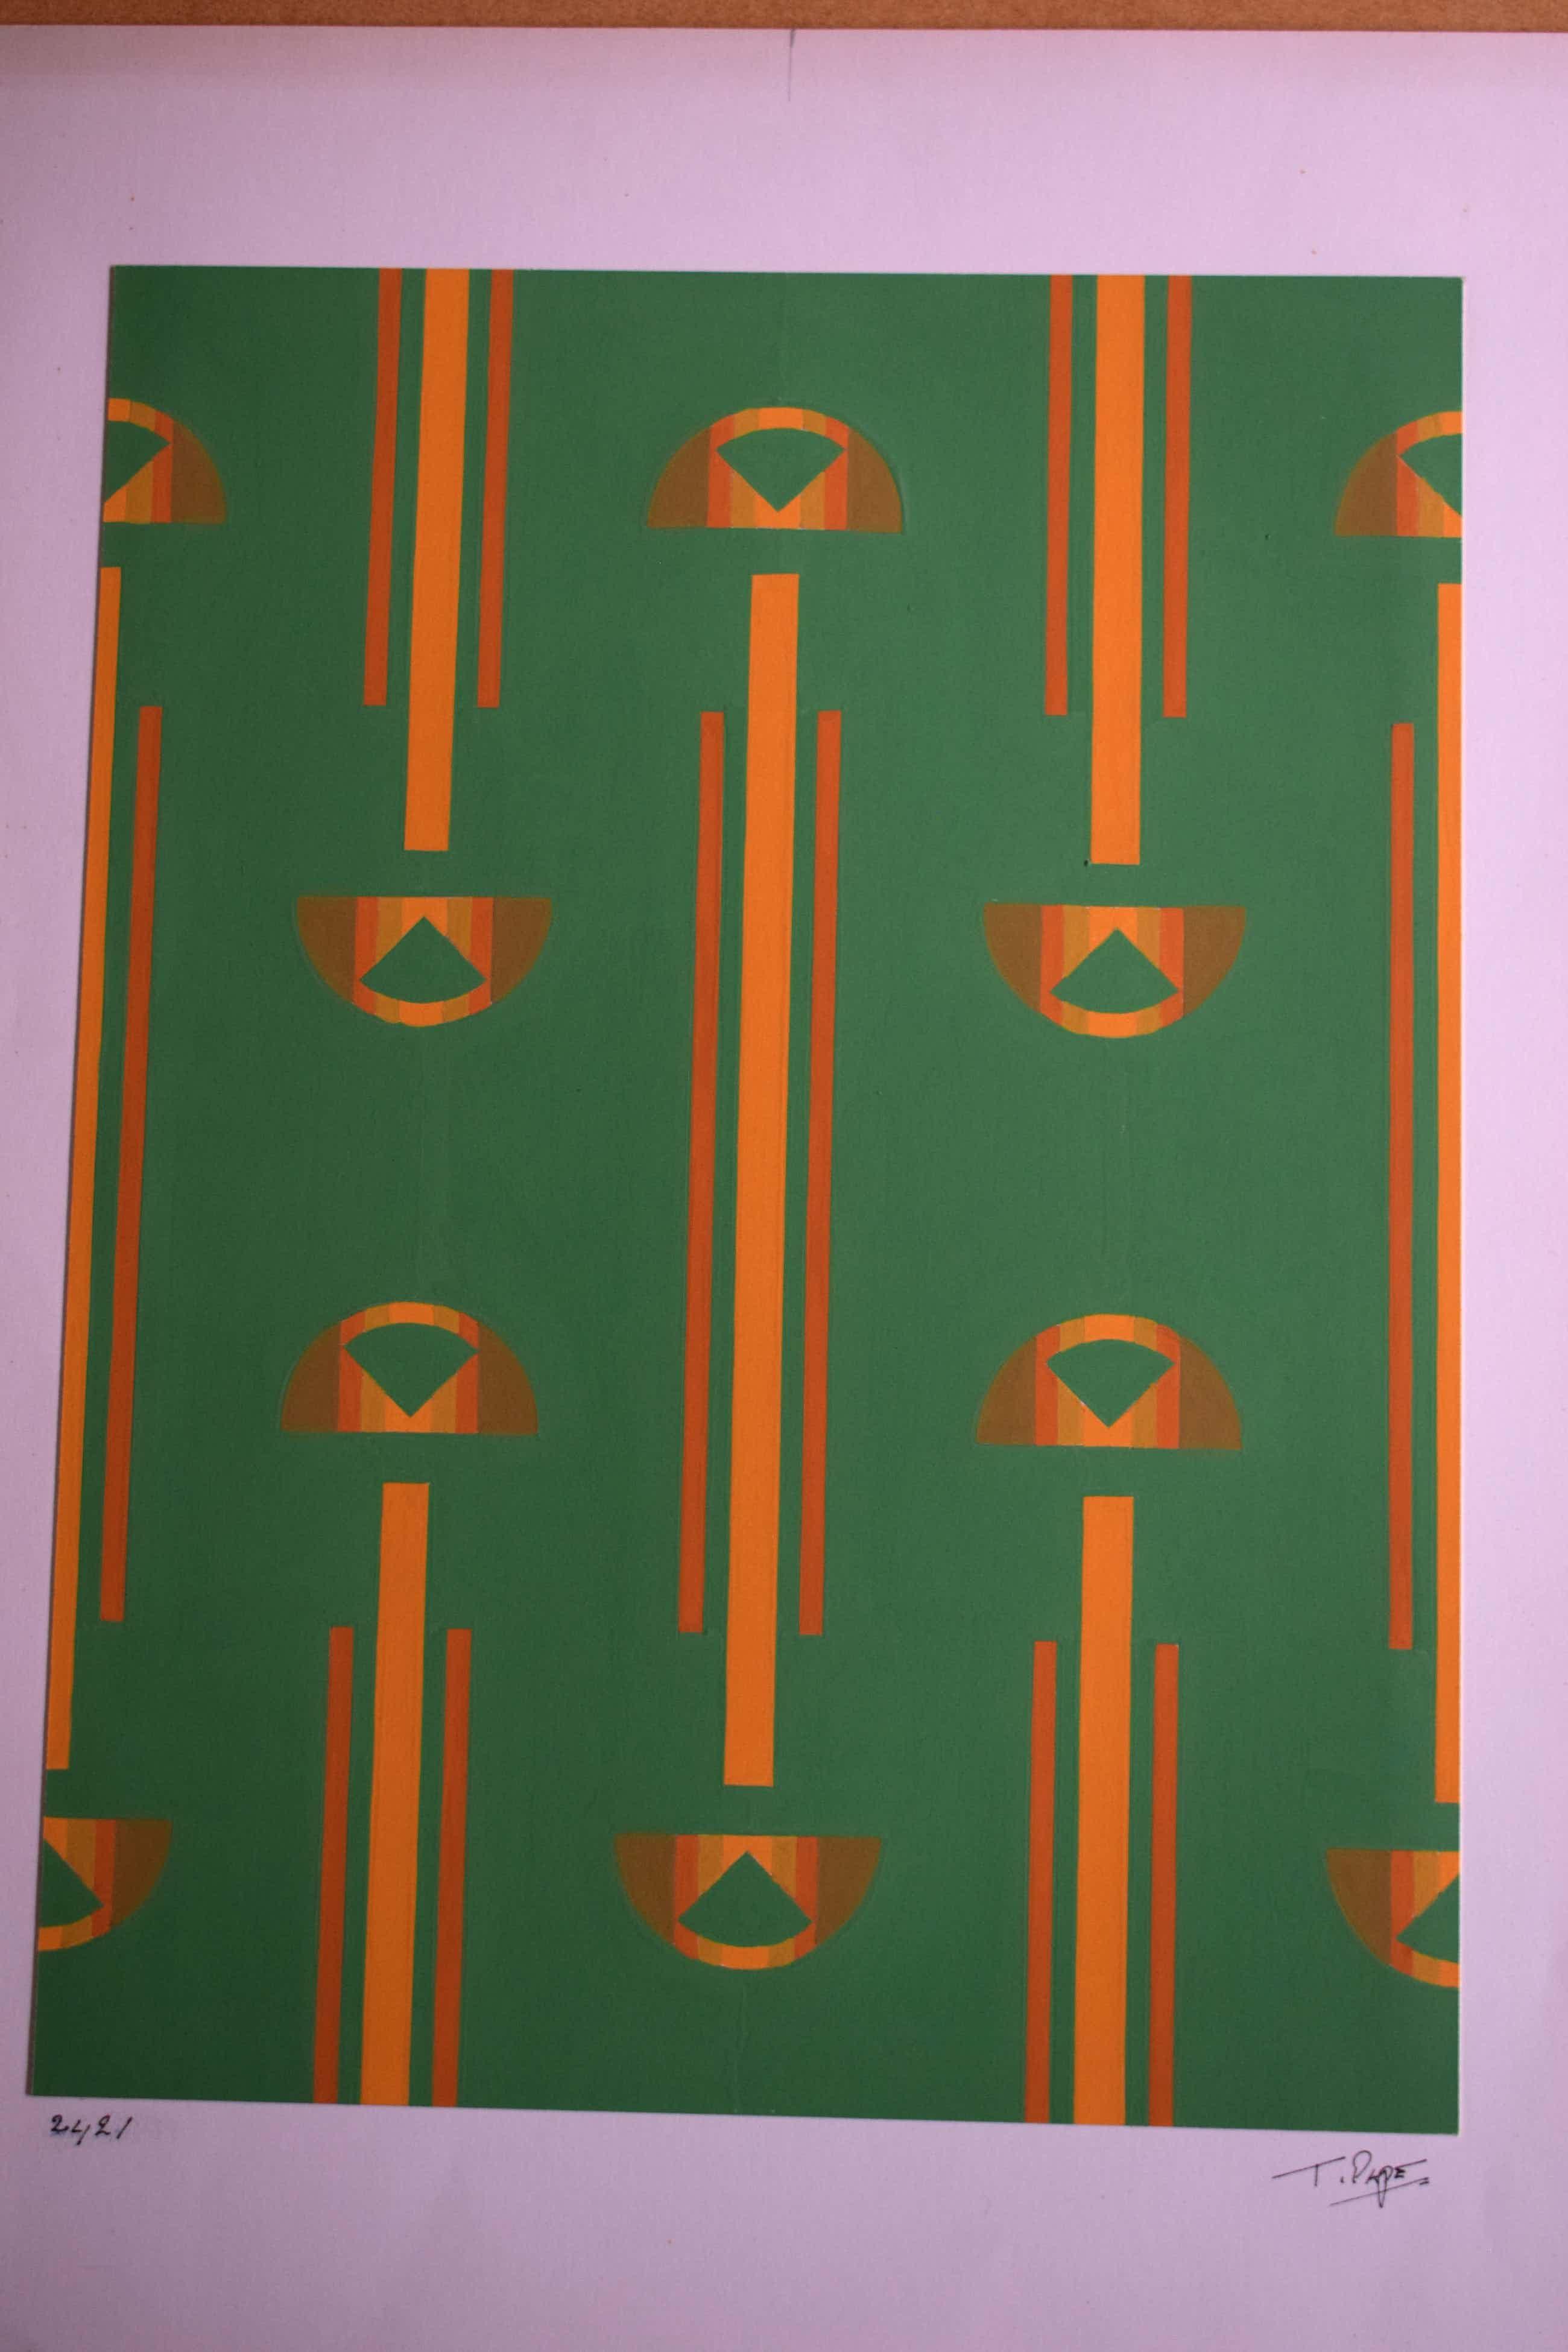 Ton Pape - Gouache - Geometrisch Abstract nr 2412 kopen? Bied vanaf 40!